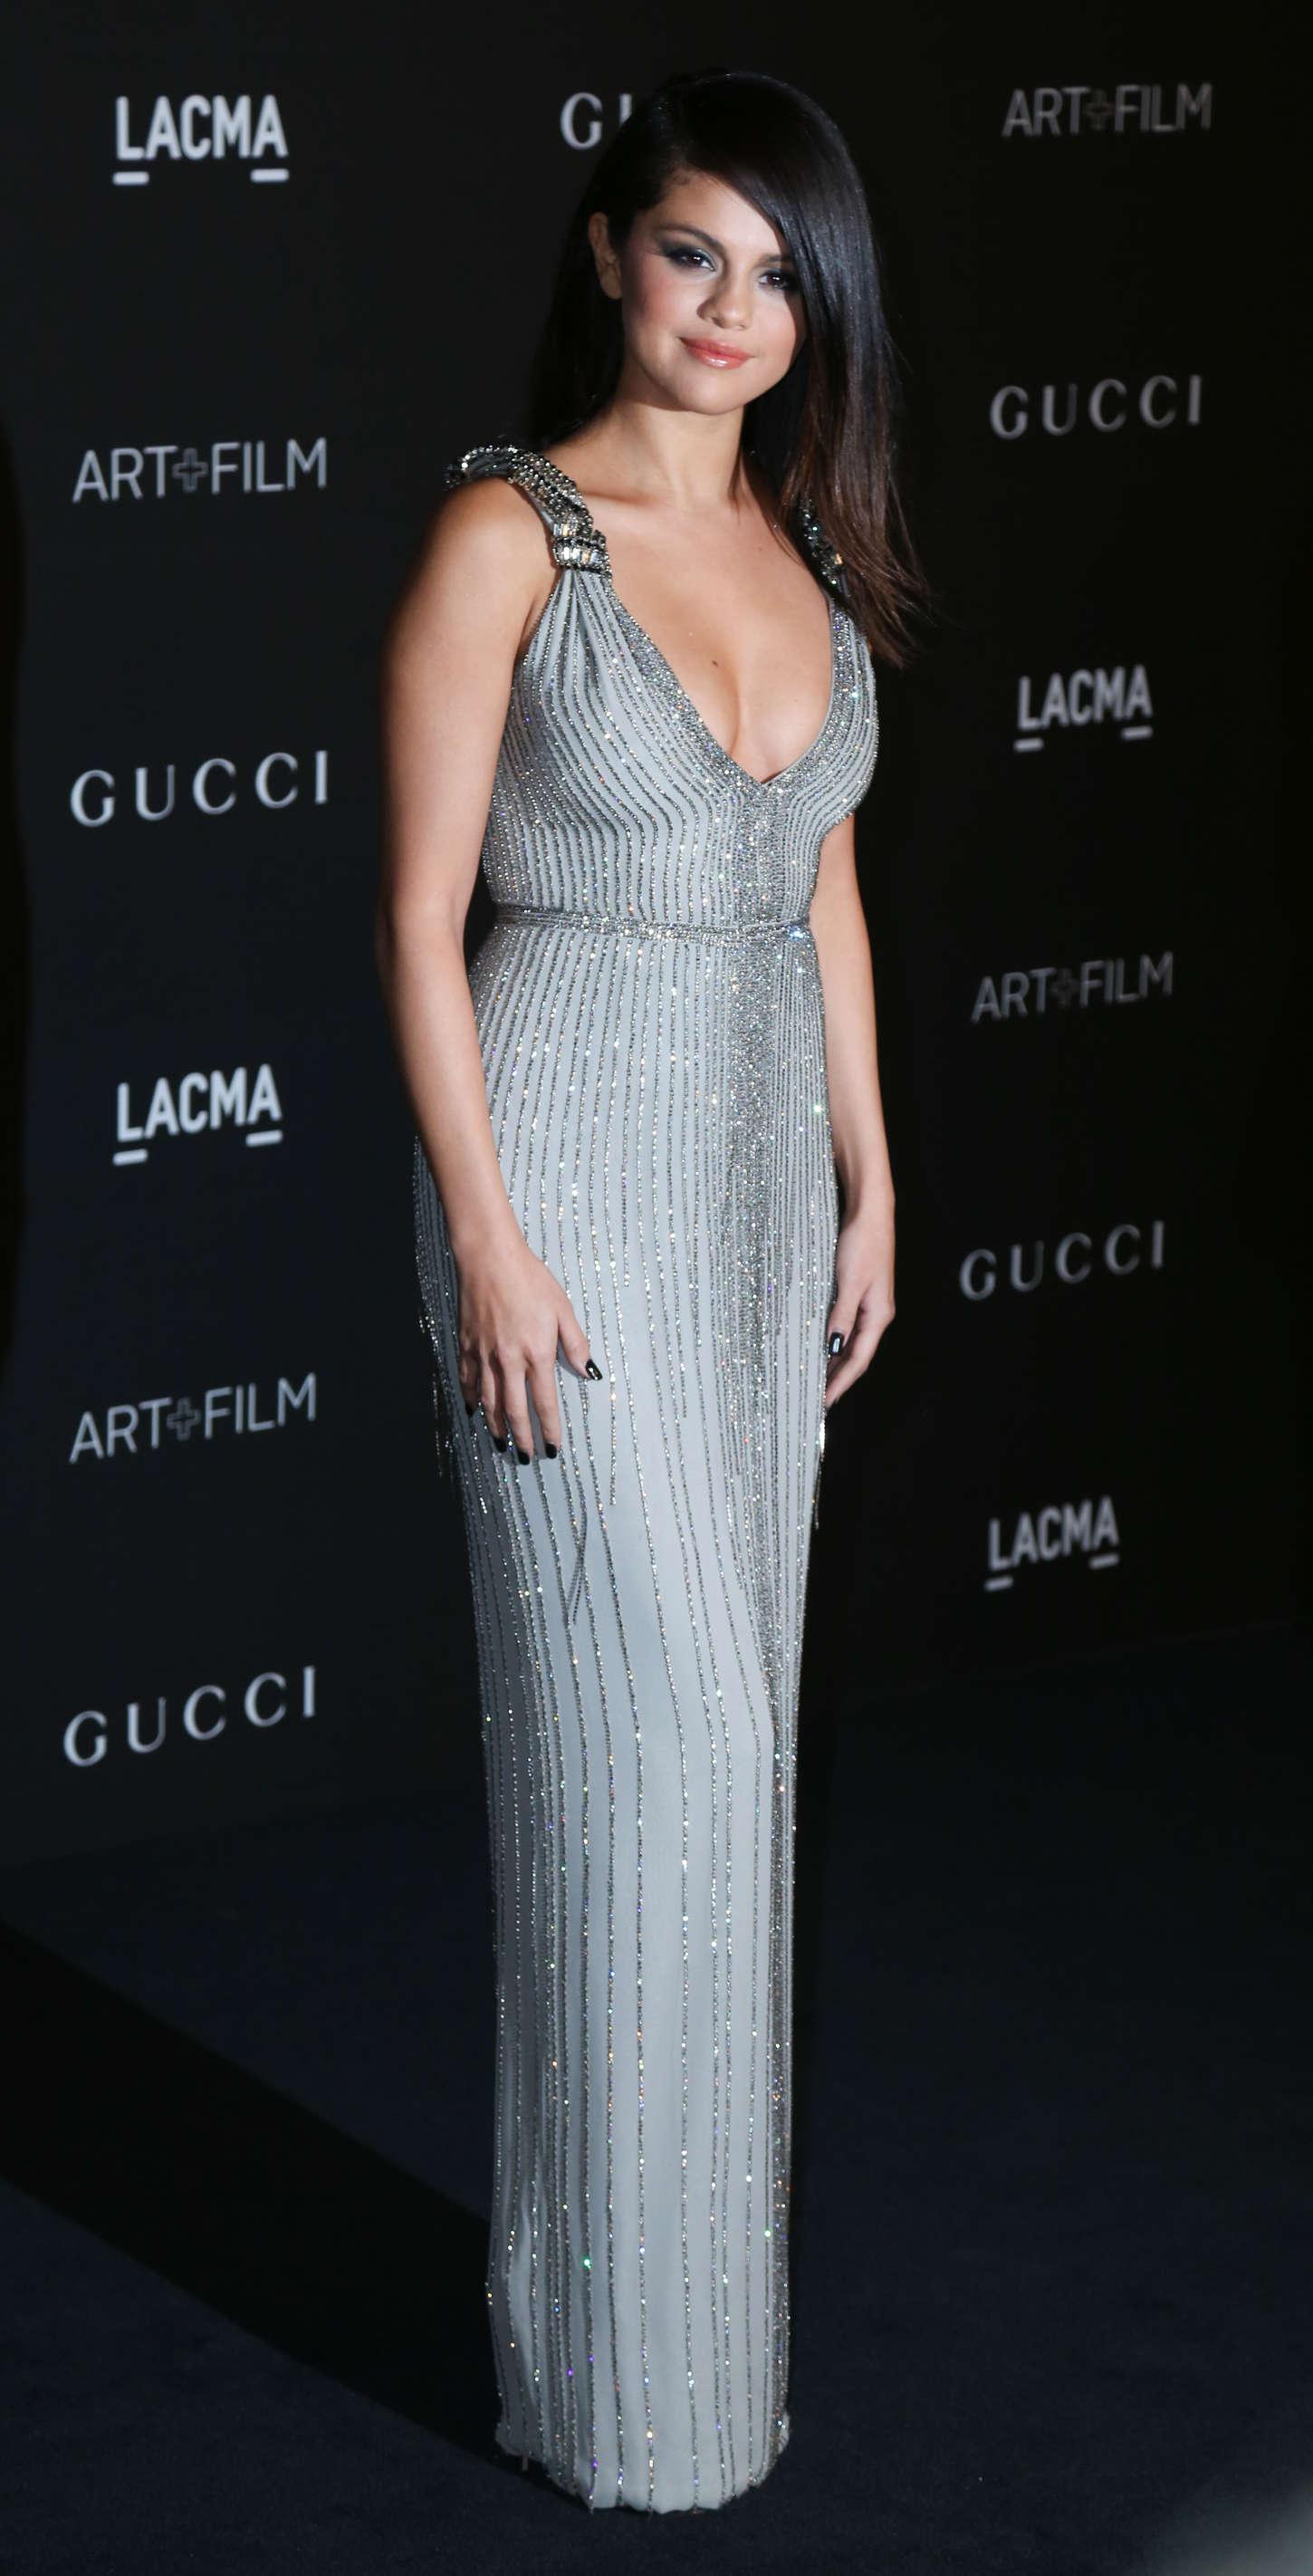 Back to FULL gallery Selena Gomez – 2014 LACMA Art + Film Gala in LA Rihanna